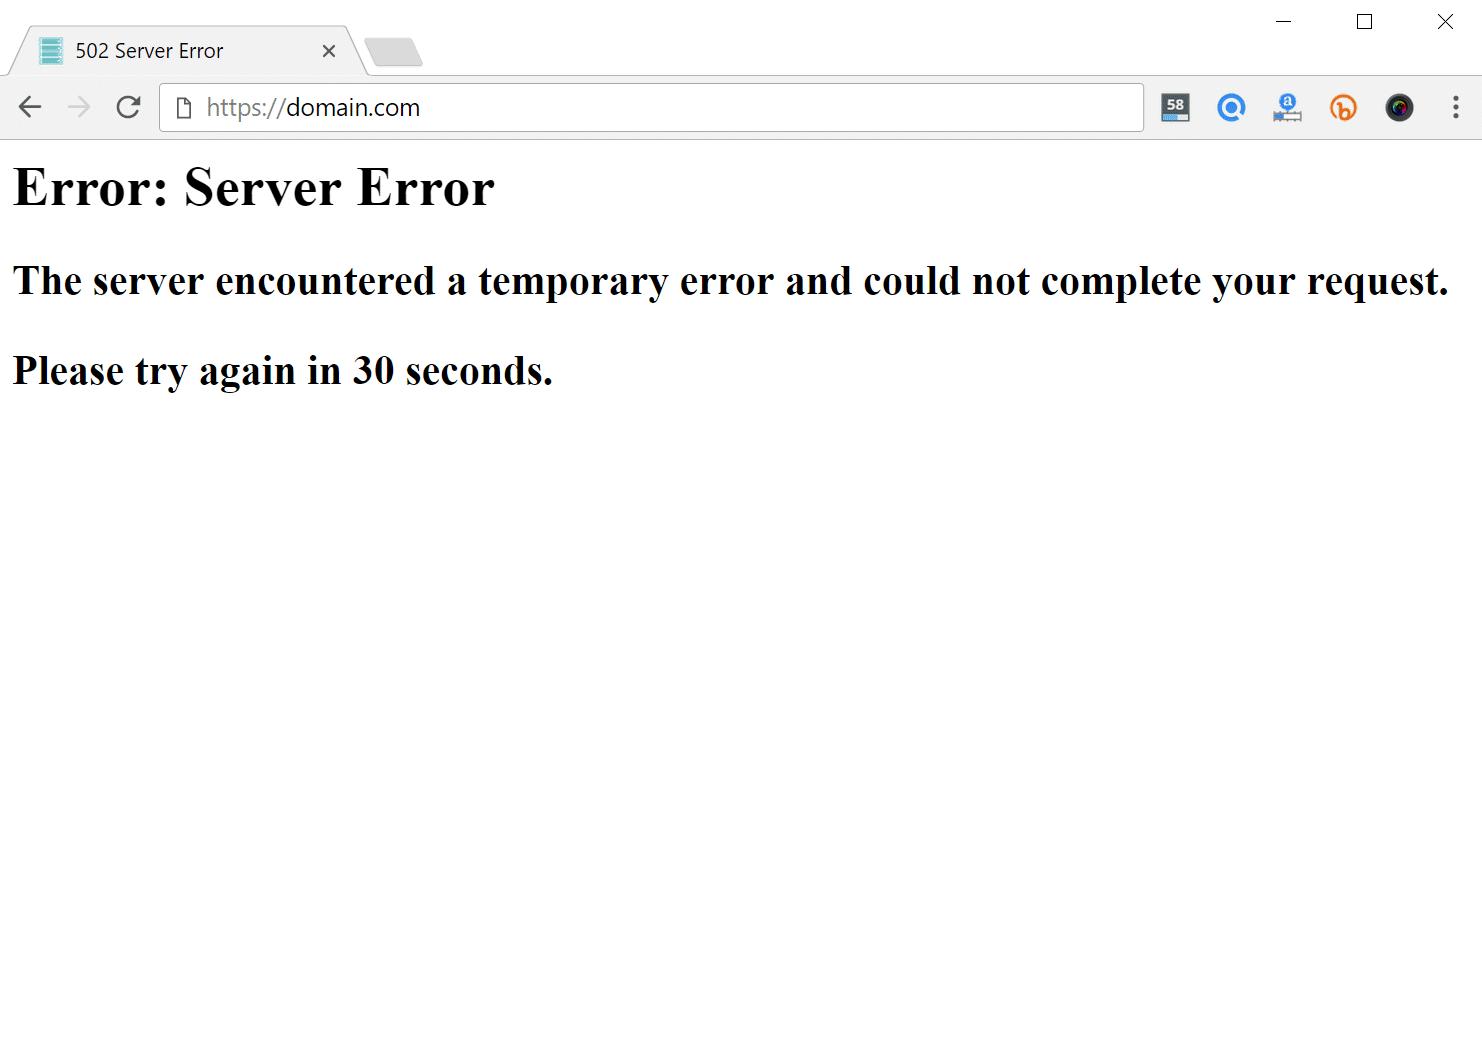 502 serverfejl i browser